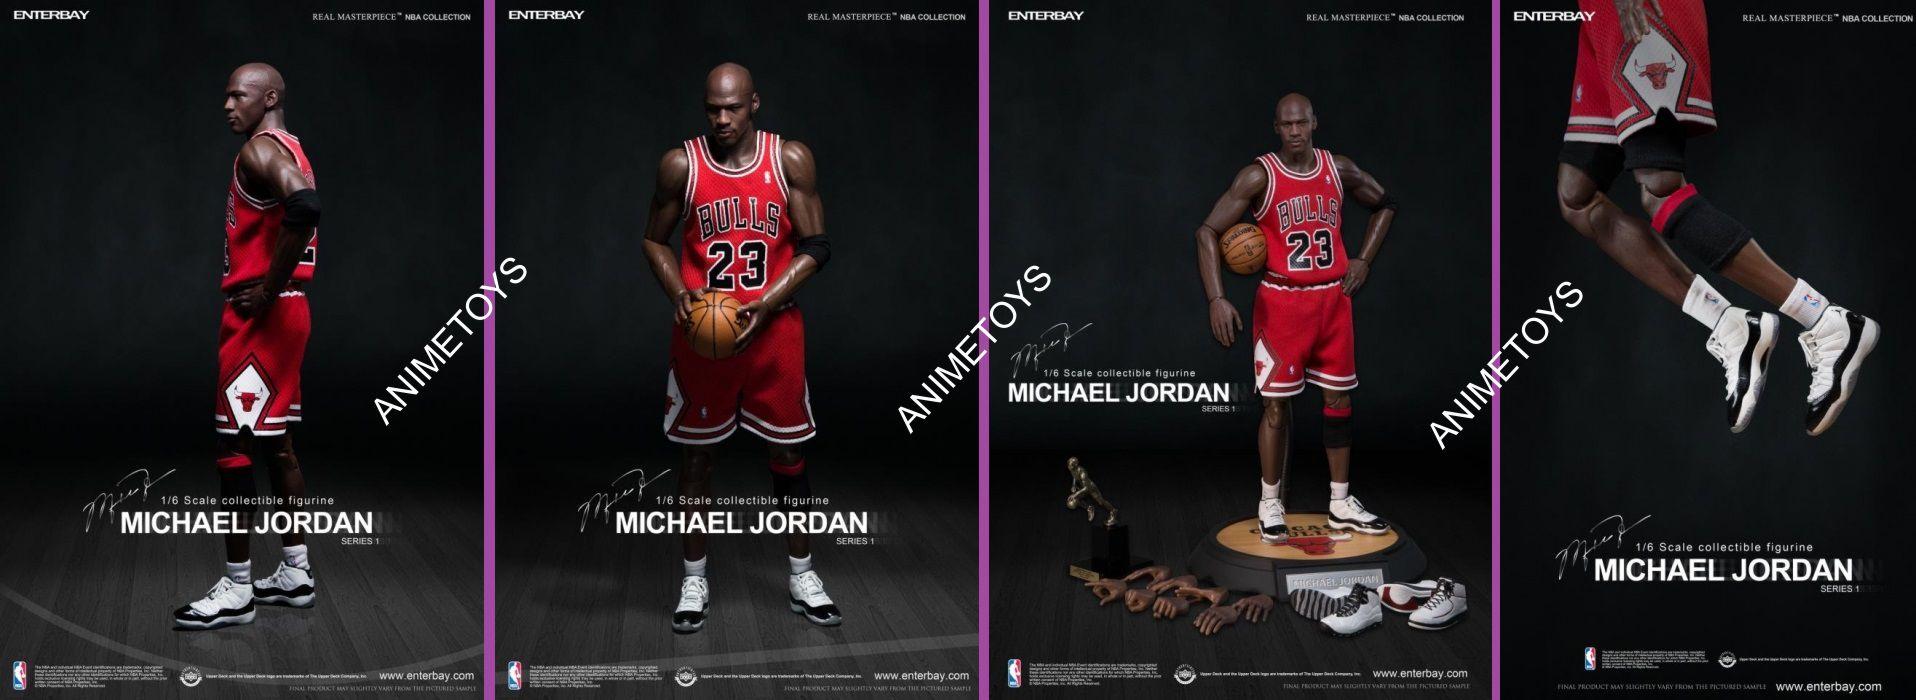 scarpe indossate da michael jordan